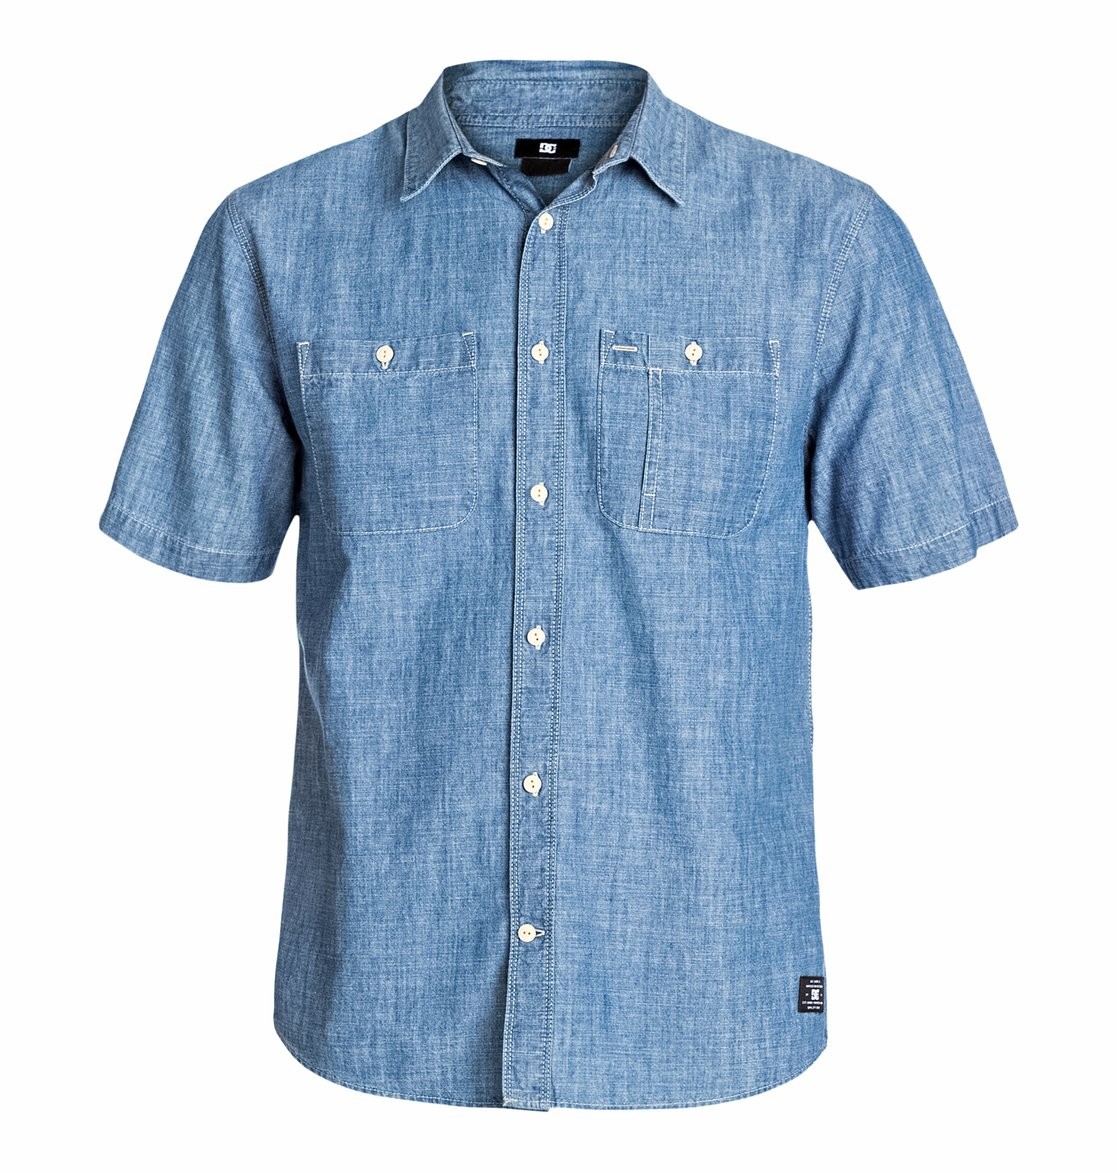 Clinton Hill SS Shirt<br>